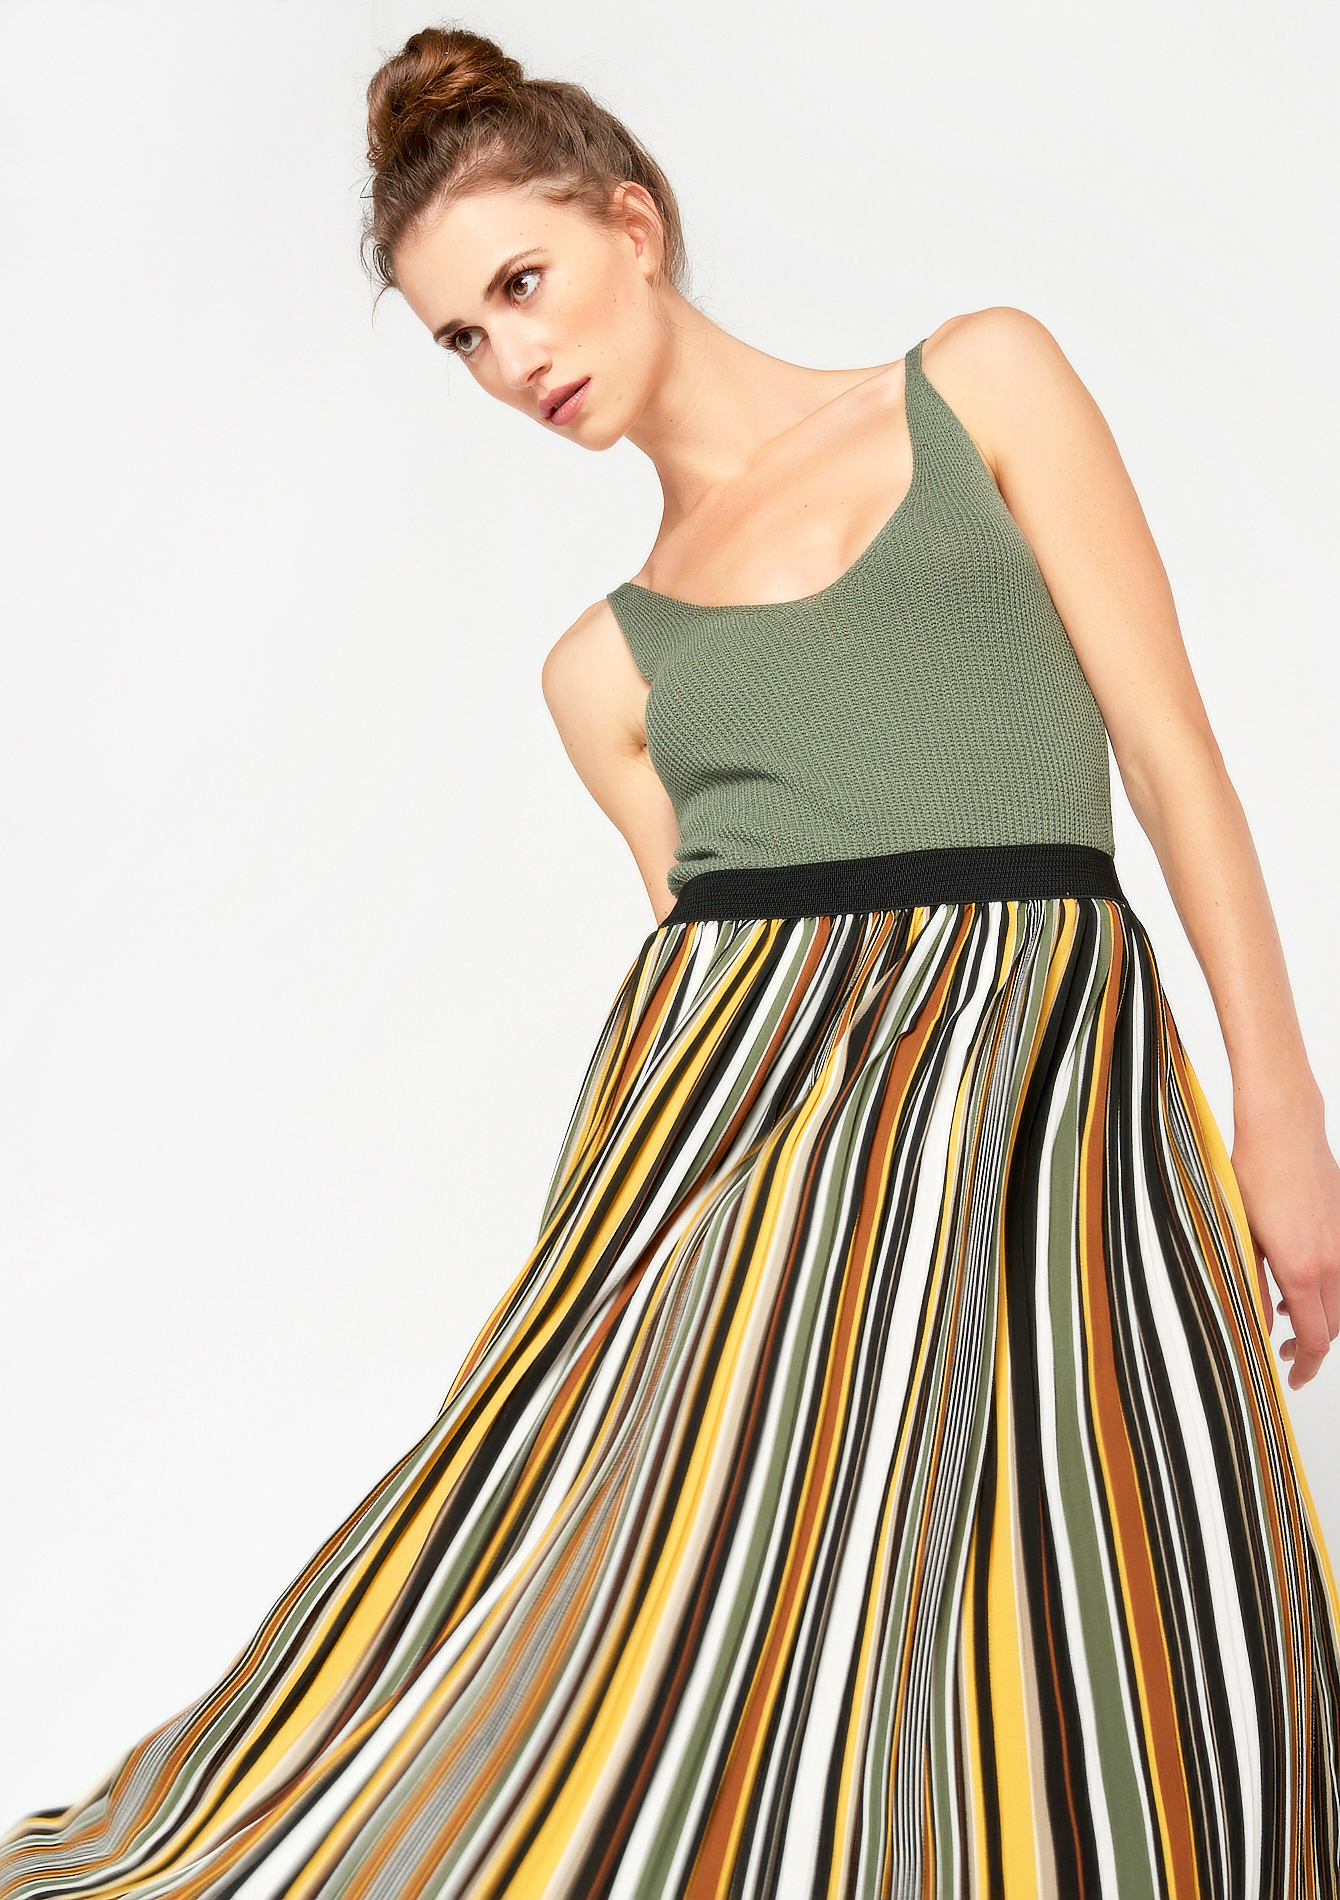 Lange plisse rok, gestreept